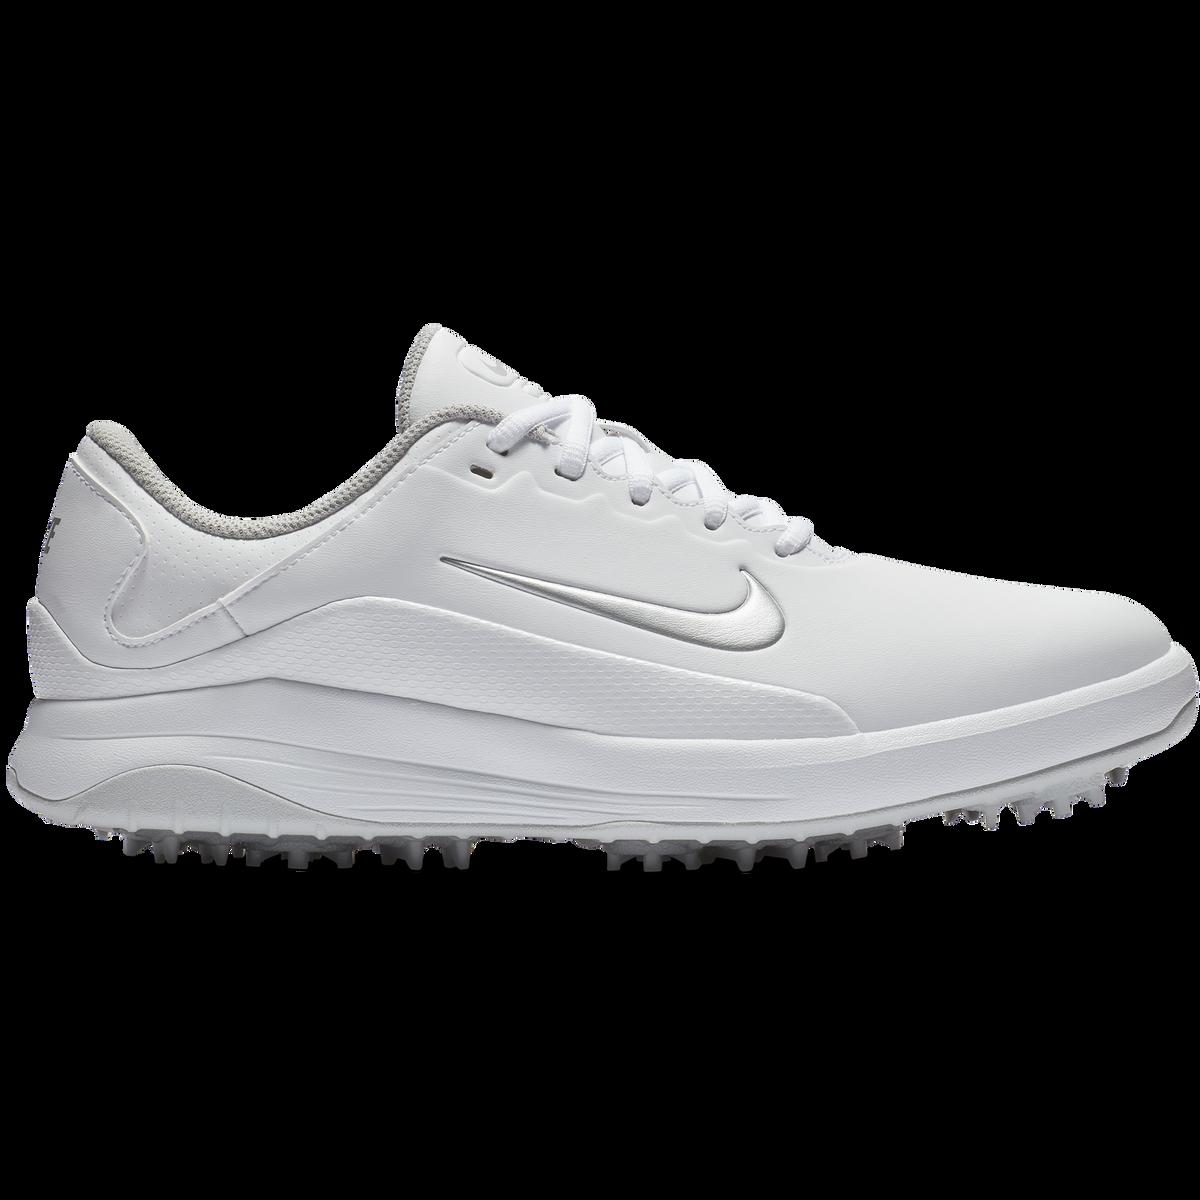 de362f9bbca Images. Nike Vapor Men  39 s Golf Shoe ...